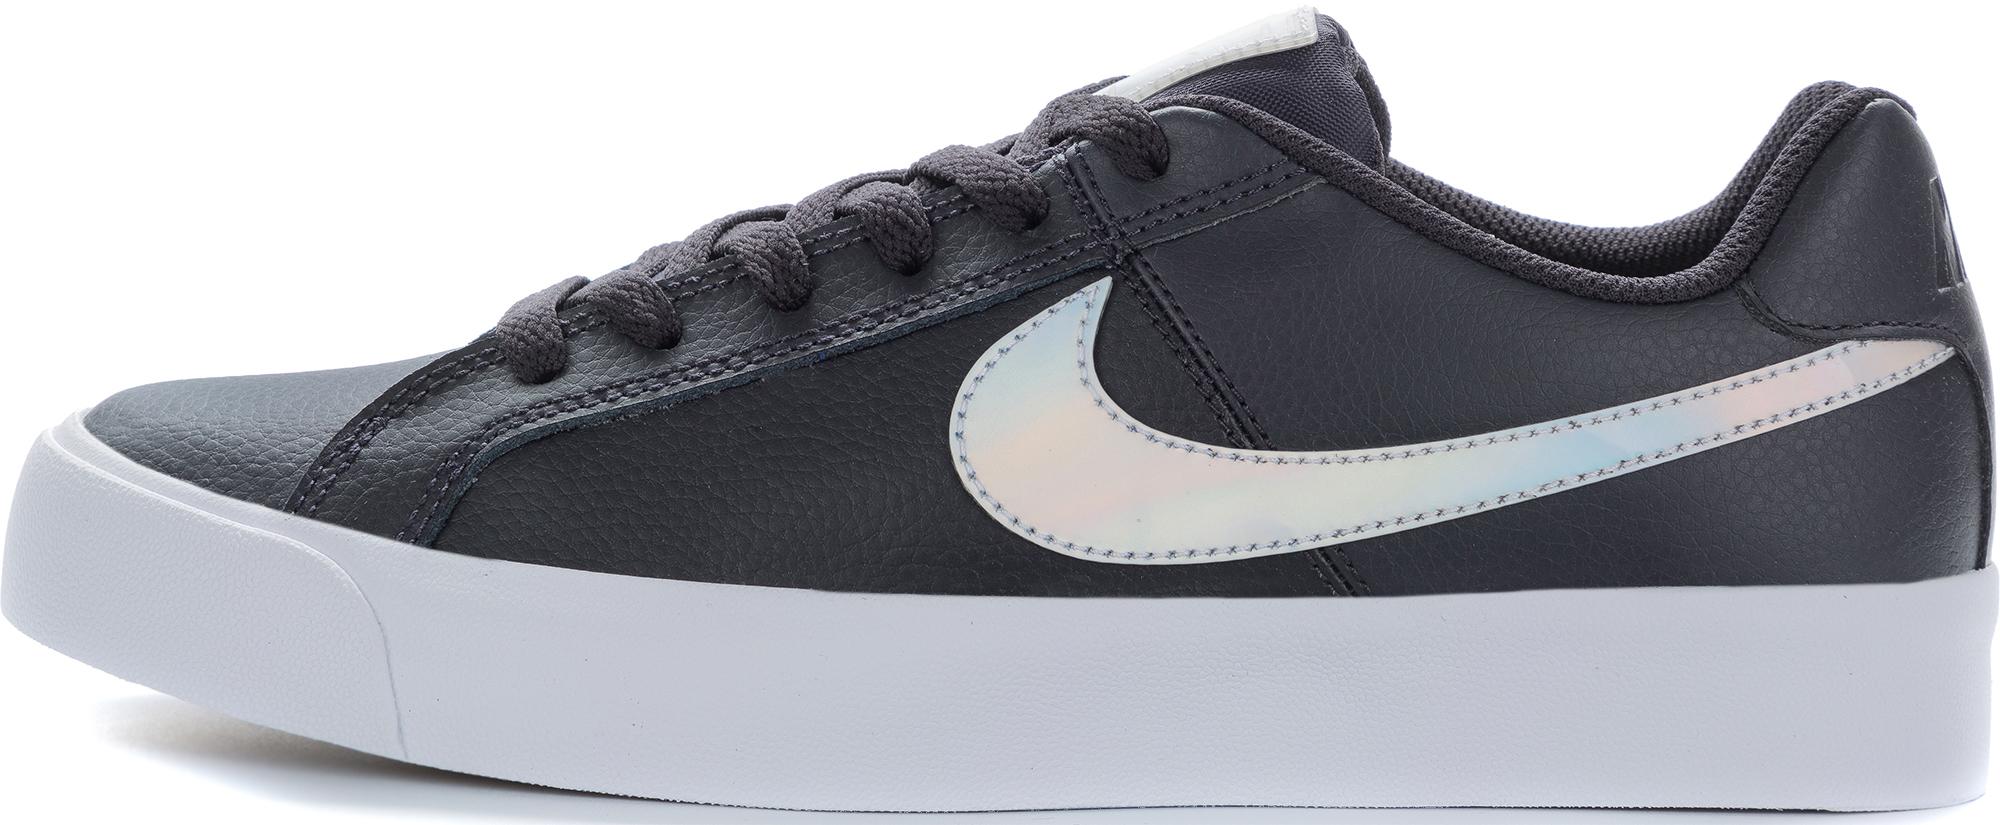 Nike Кеды женские Nike Court Royale AC, размер 37,5